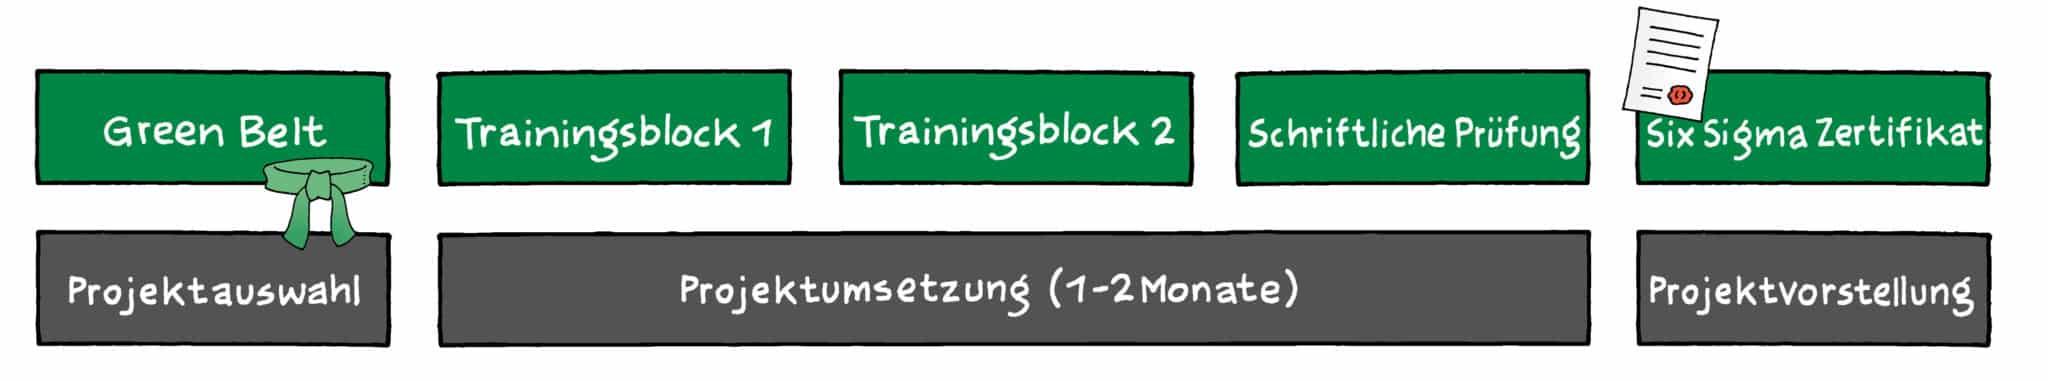 Six Sigma Green Belt Ausbildung | Training | Seminar (9+1 Tage)